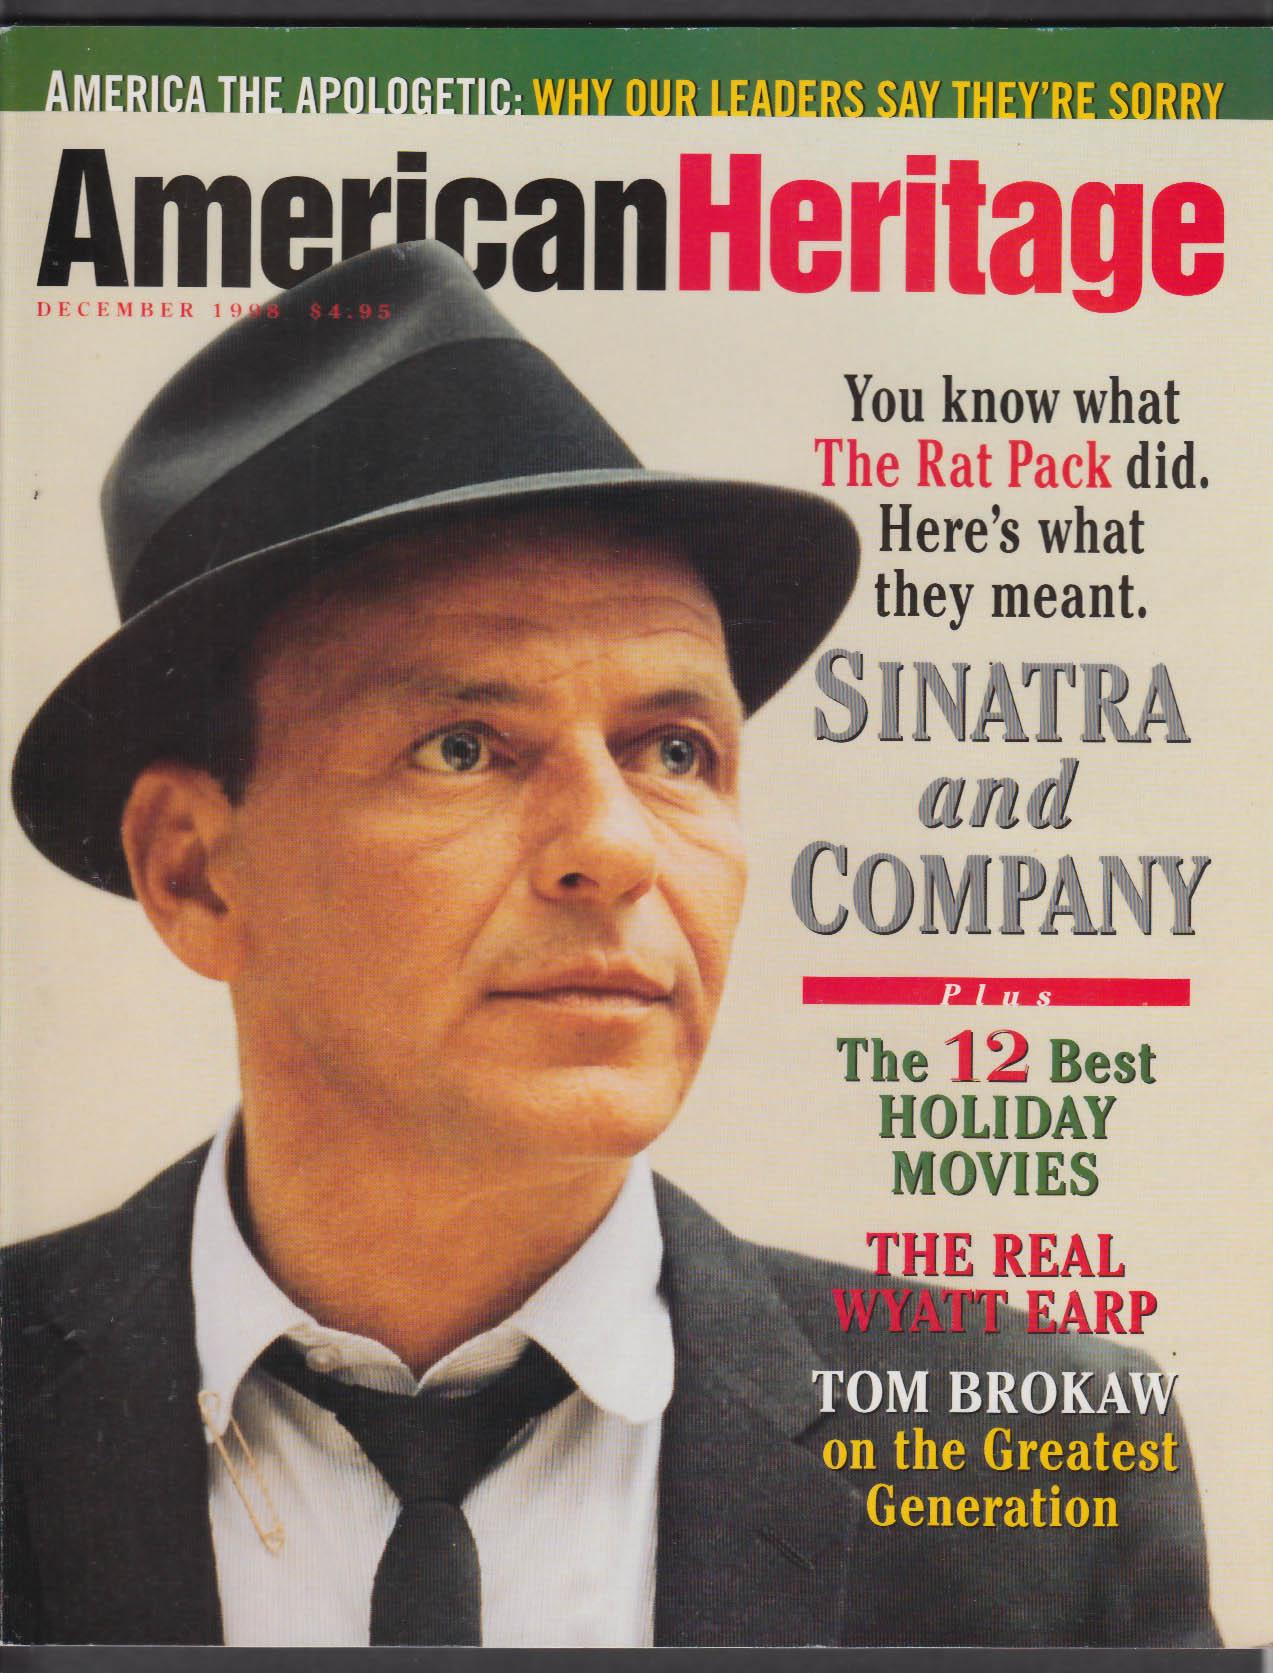 AMERICAN HERITAGE Frank Sinatra Wyatt Earp Tom Brokaw Saburo Sakai + 12 1998